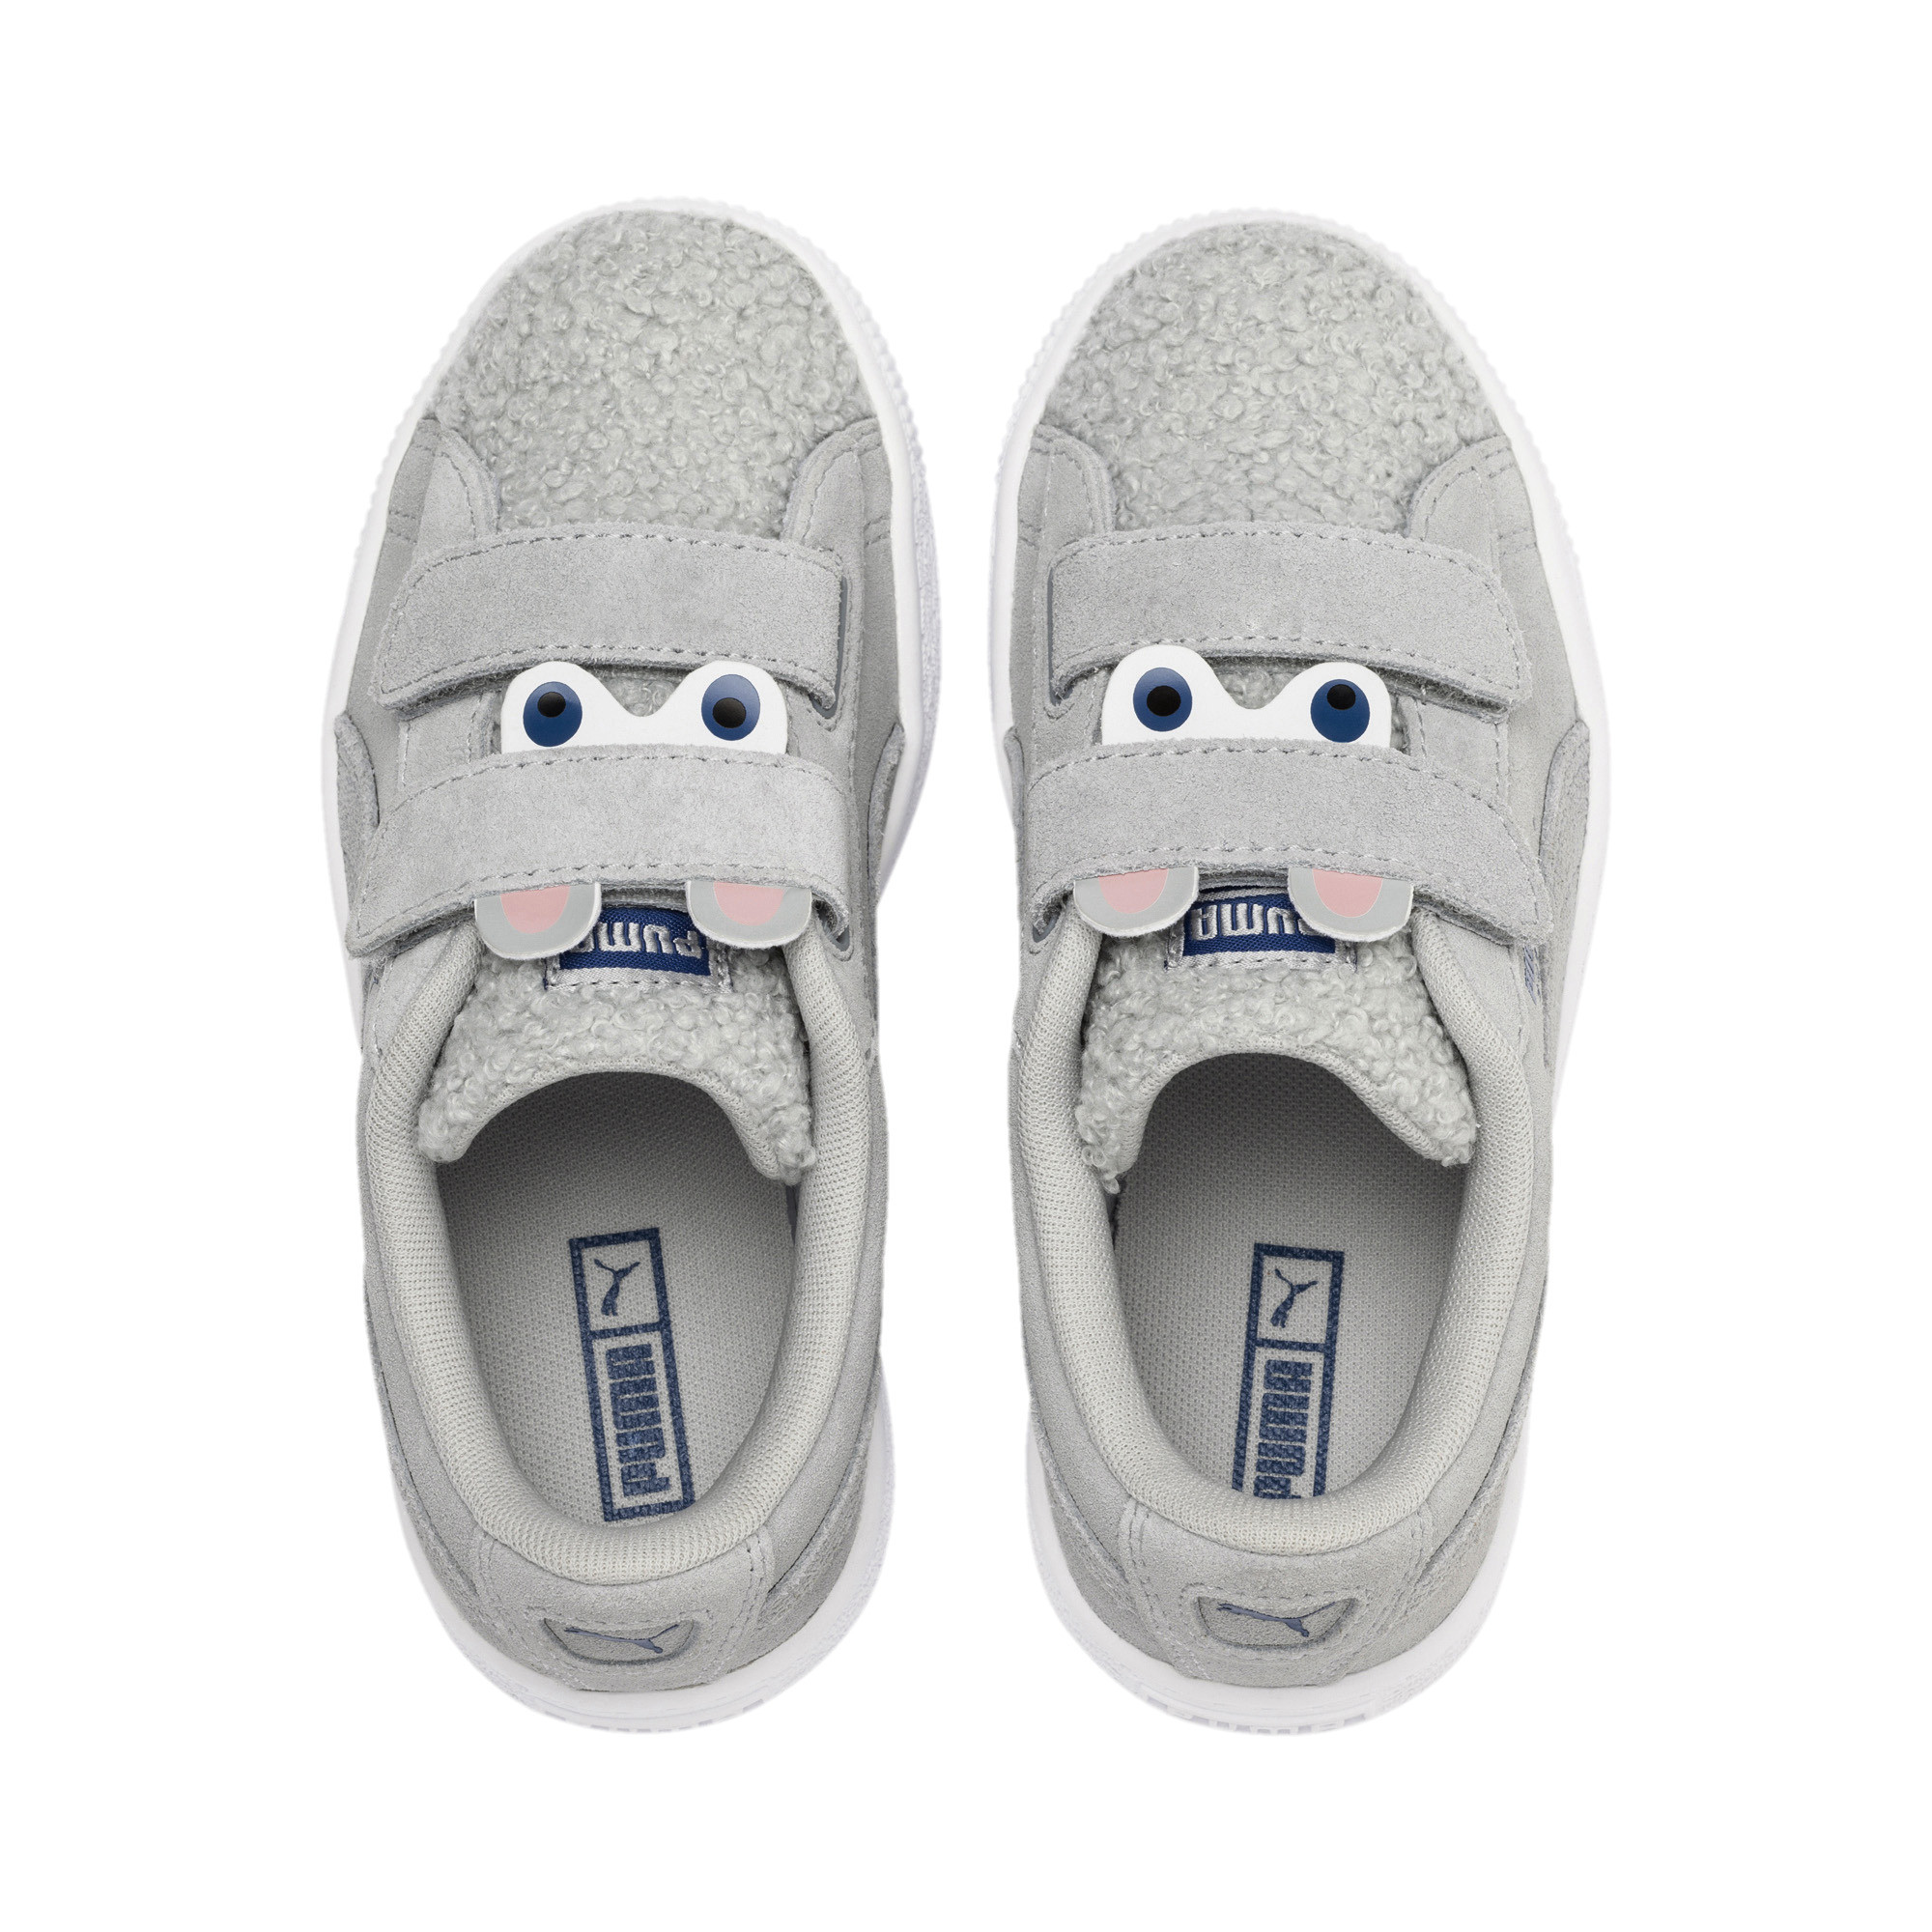 PUMA-Suede-Winter-Monster-Little-Kids-039-Shoes-Kids-Shoe-Kids thumbnail 14